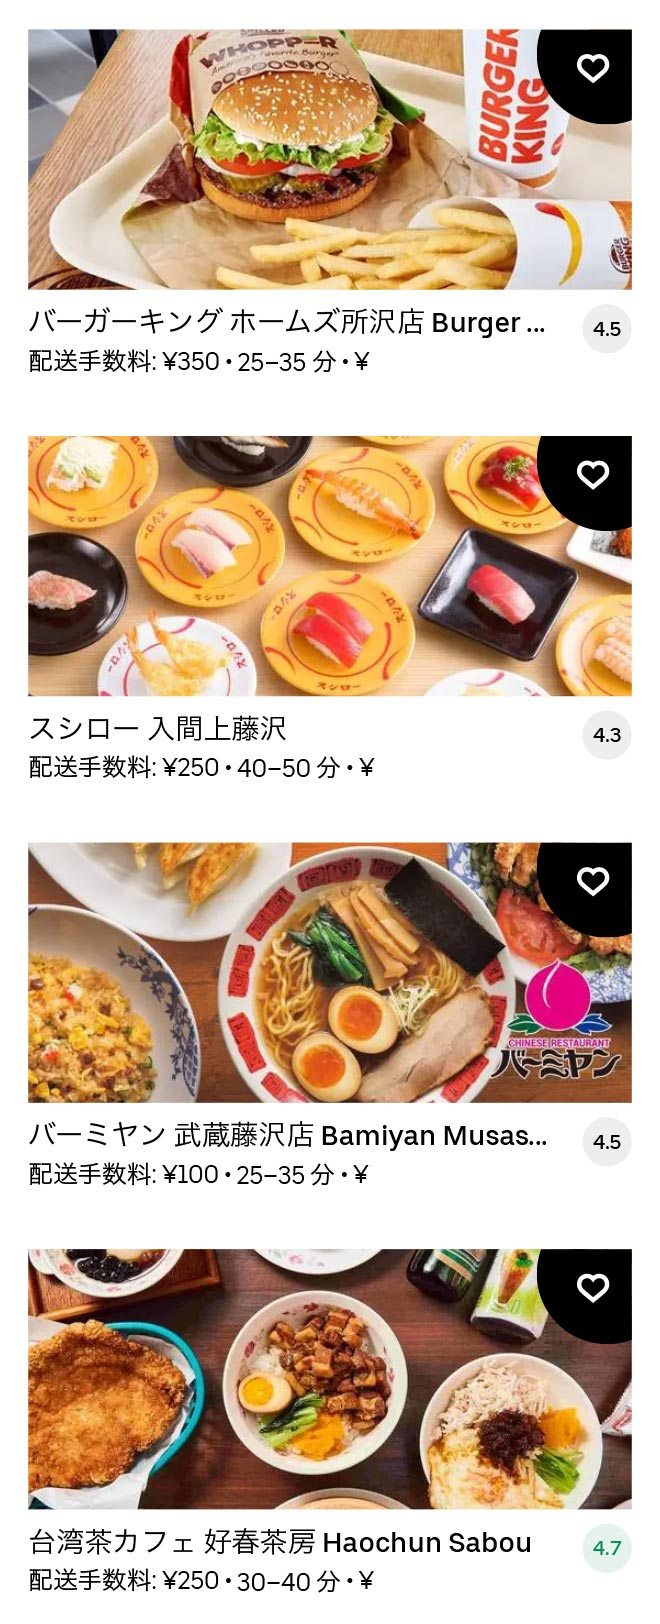 Musashi fujisawa menu 2101 04